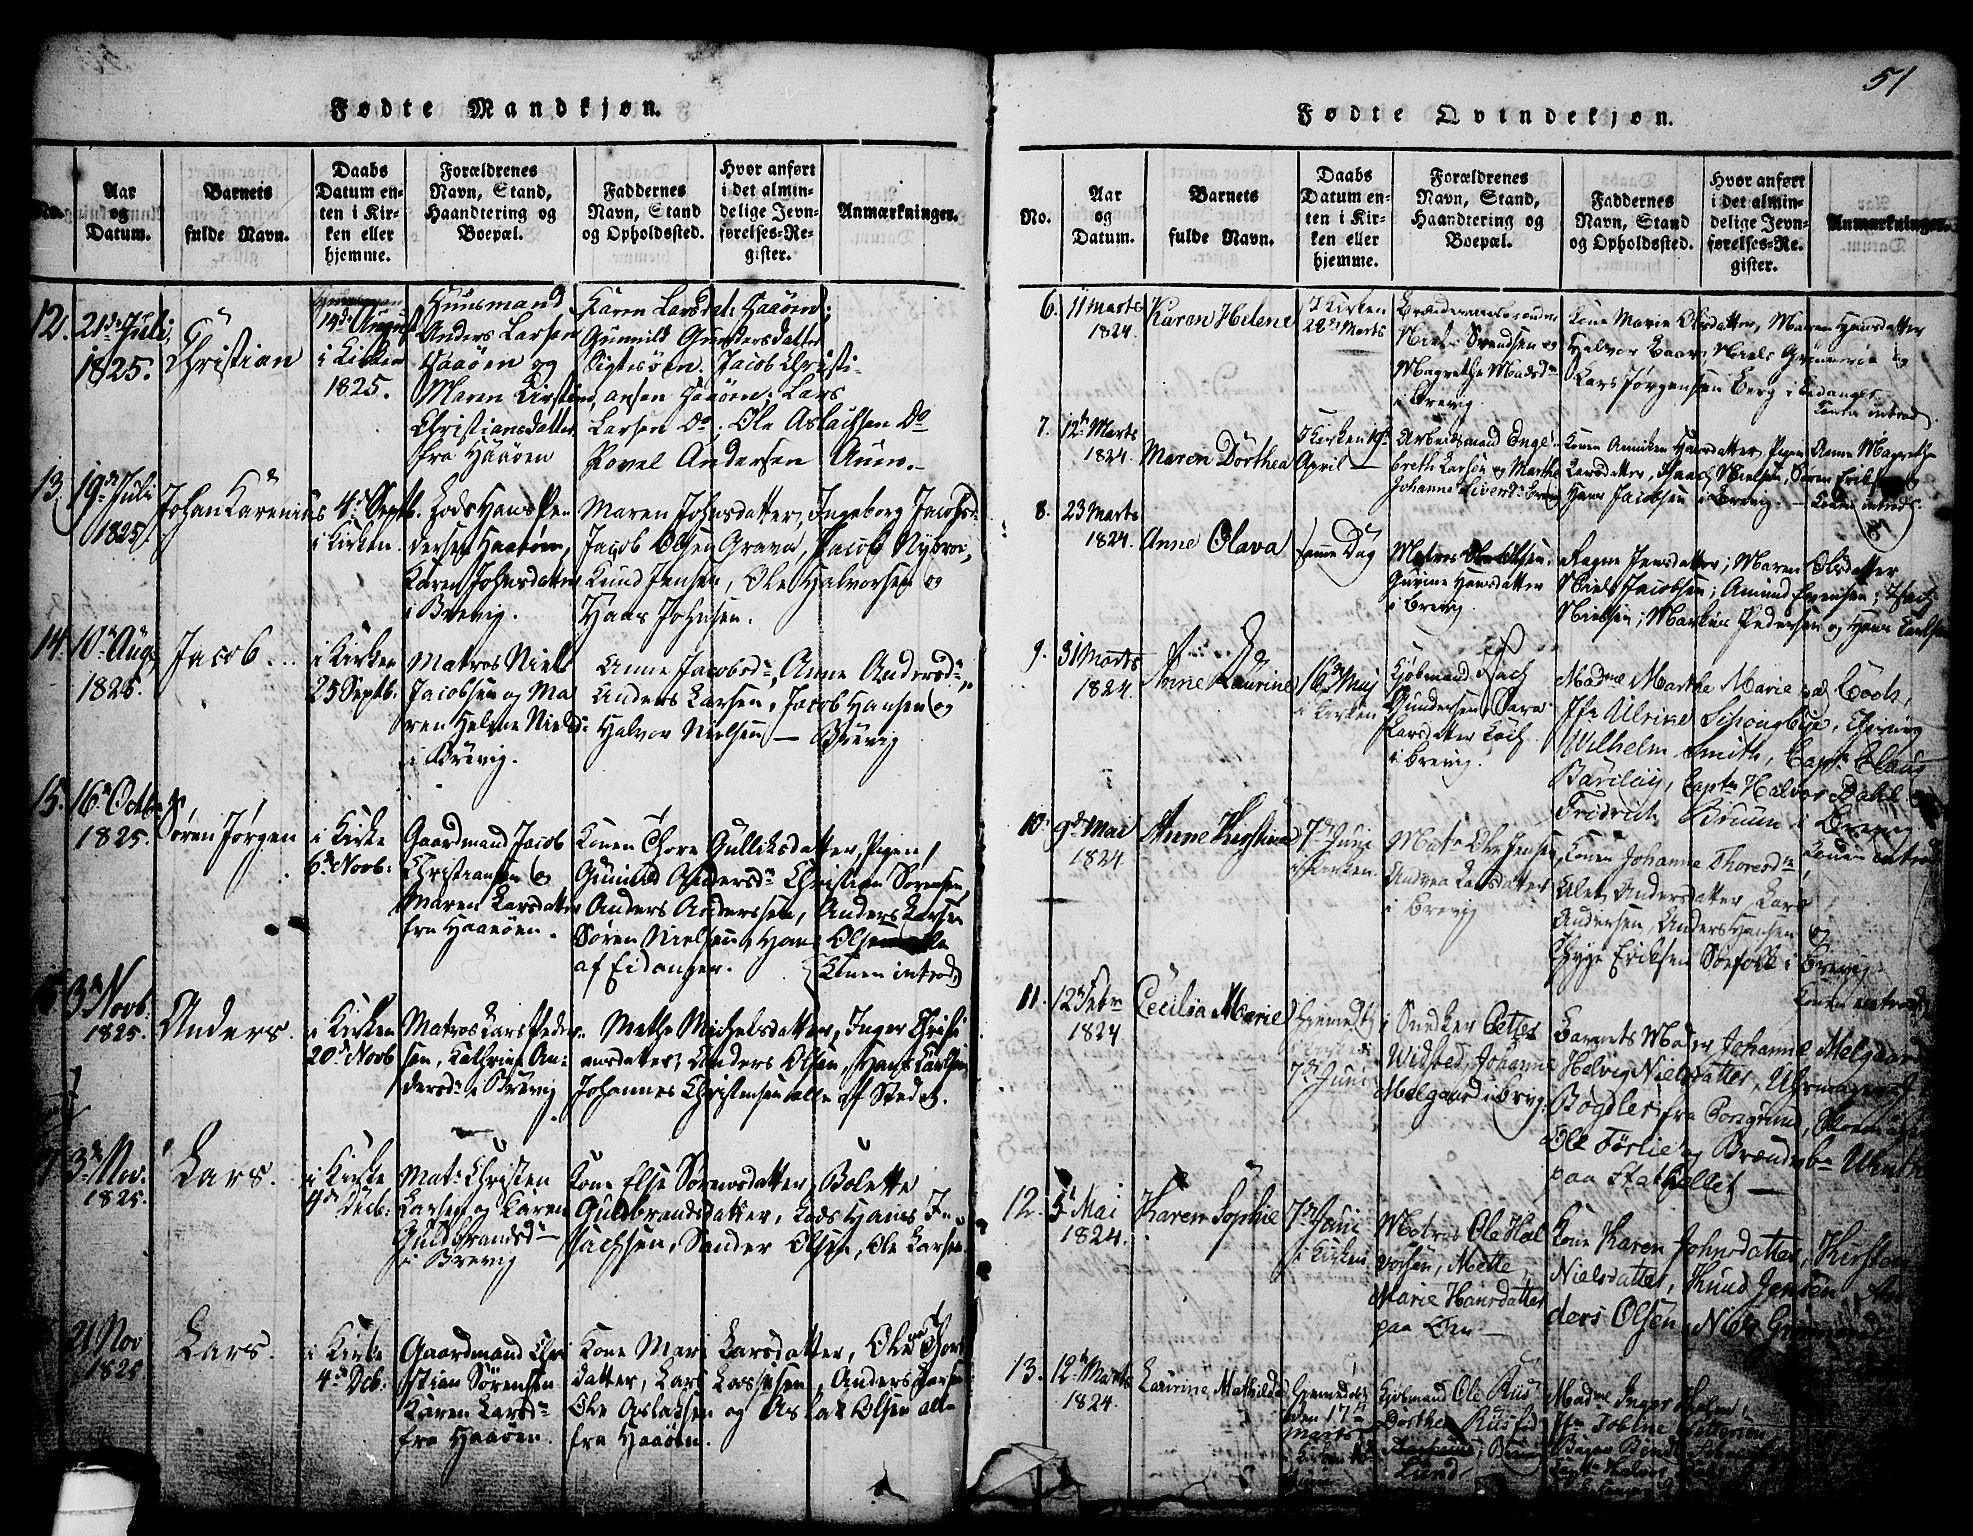 SAKO, Brevik kirkebøker, G/Ga/L0001: Klokkerbok nr. 1, 1814-1845, s. 51